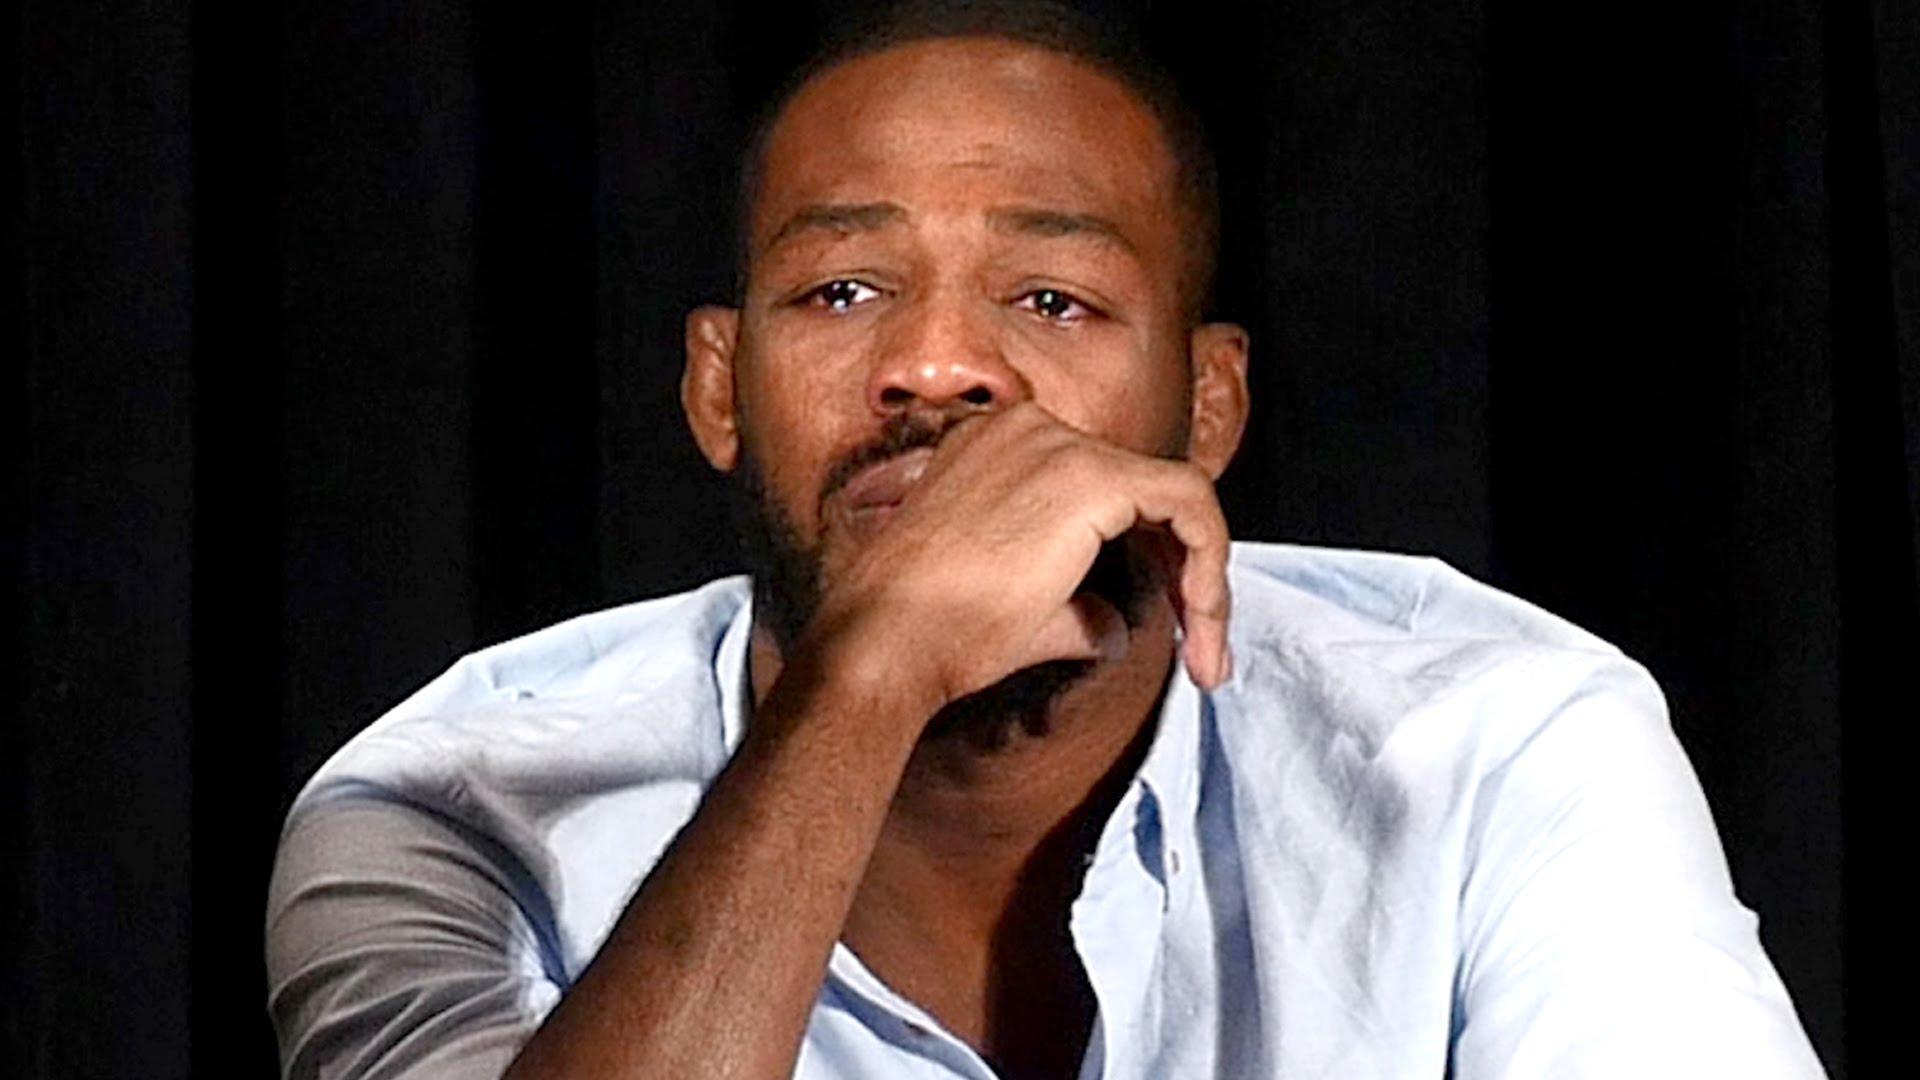 Jon Jones shoots down questions on VADA testing; promises to address them after UFC 232 - Jones